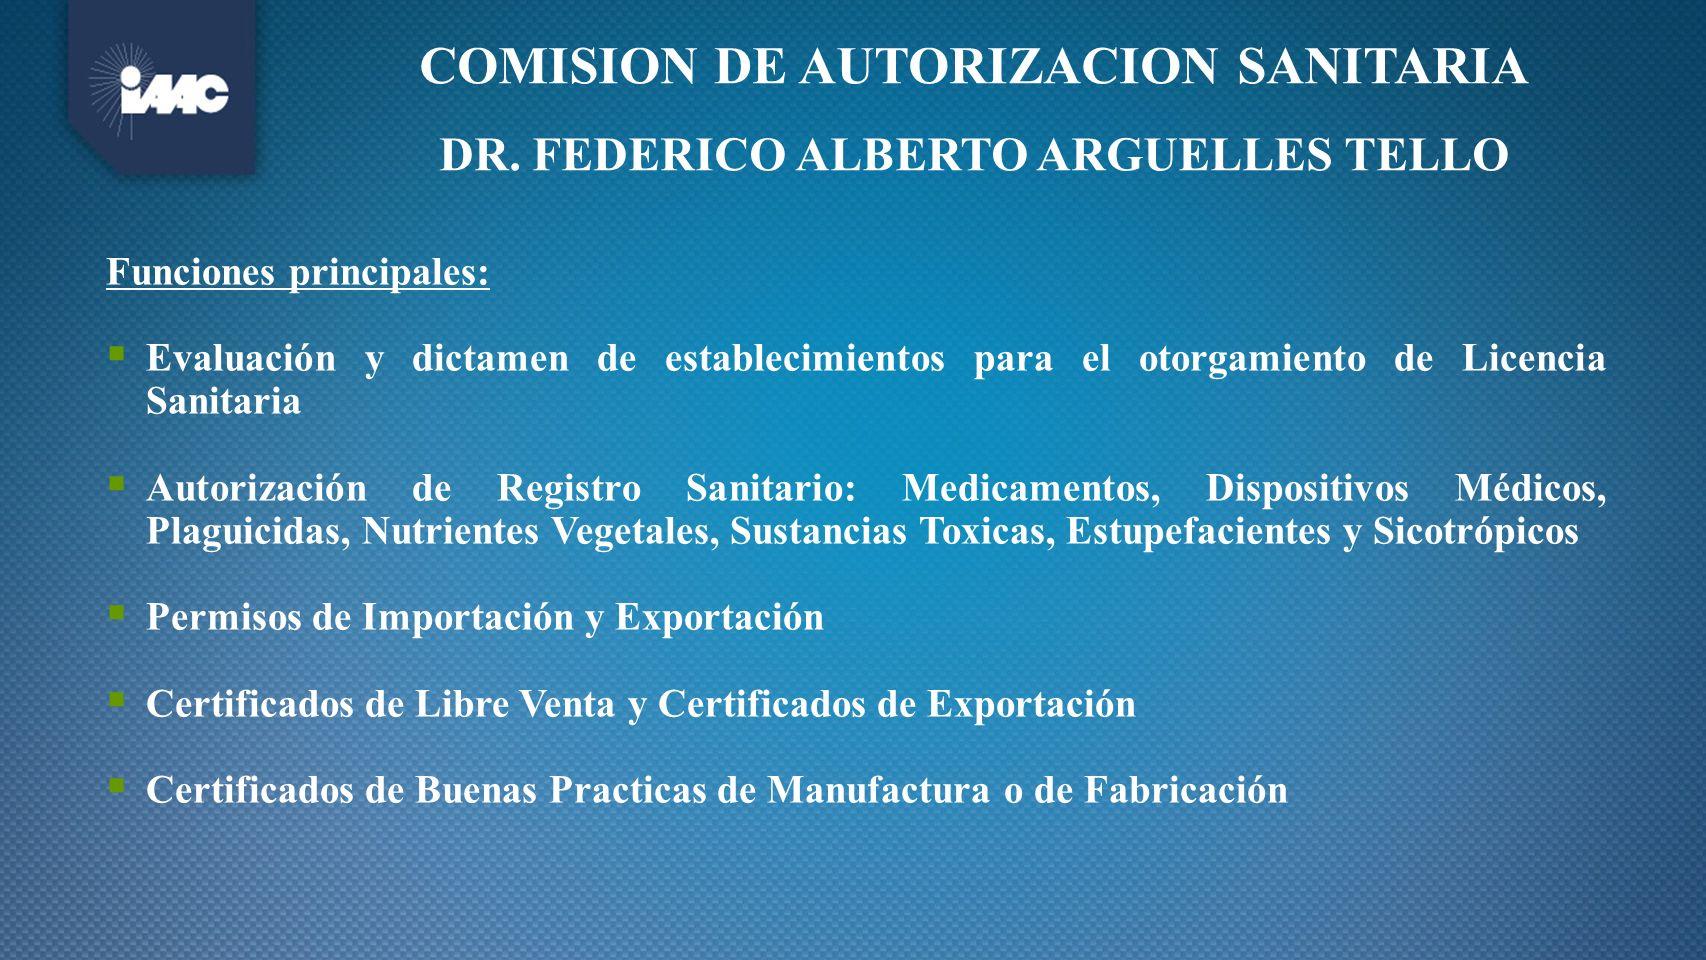 COMISION DE AUTORIZACION SANITARIA